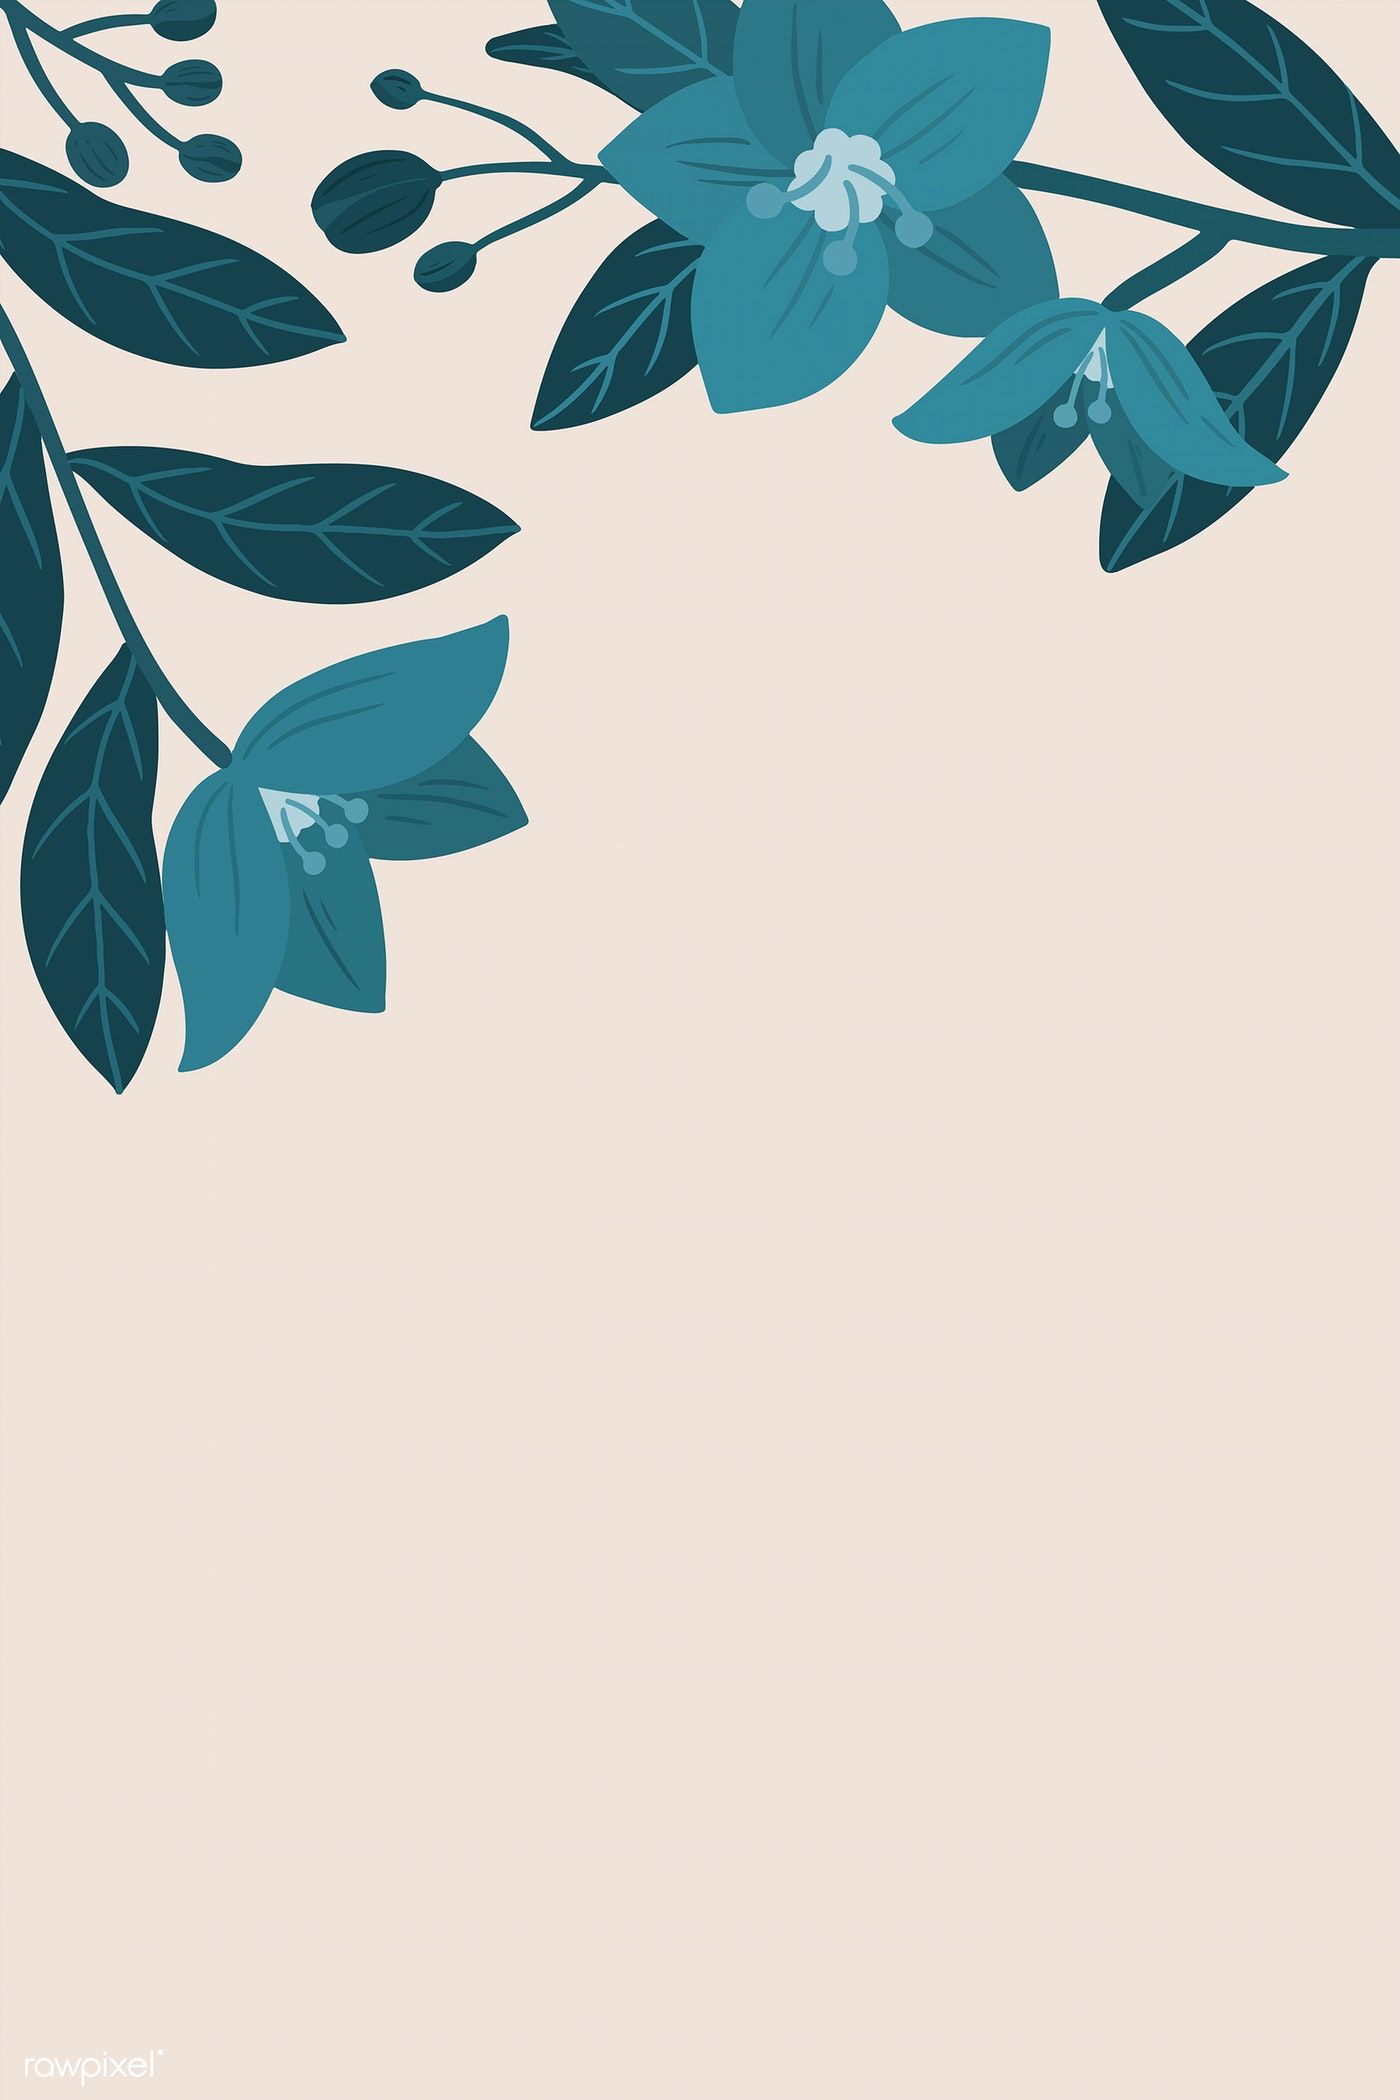 Botanical blue flower copy space on a peach background